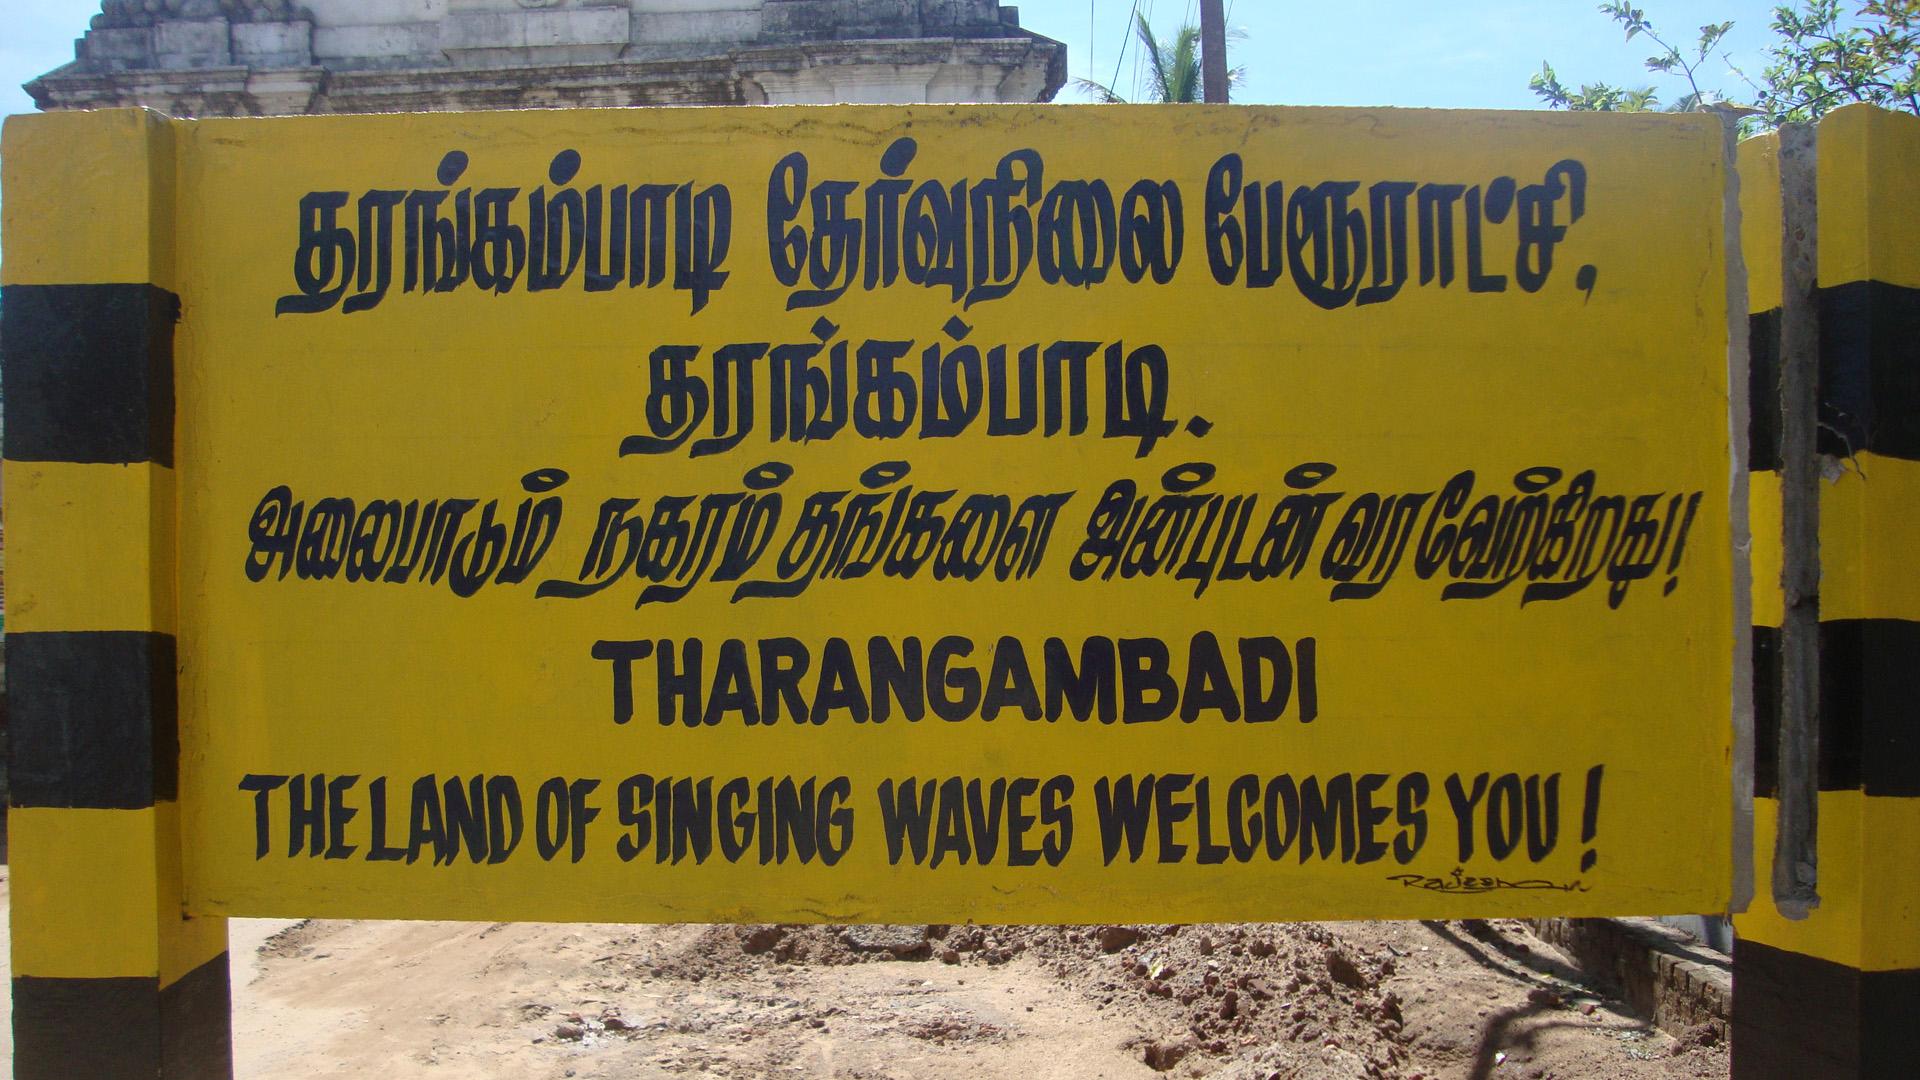 Tranquil Tranquebar (or Tharangambadi)